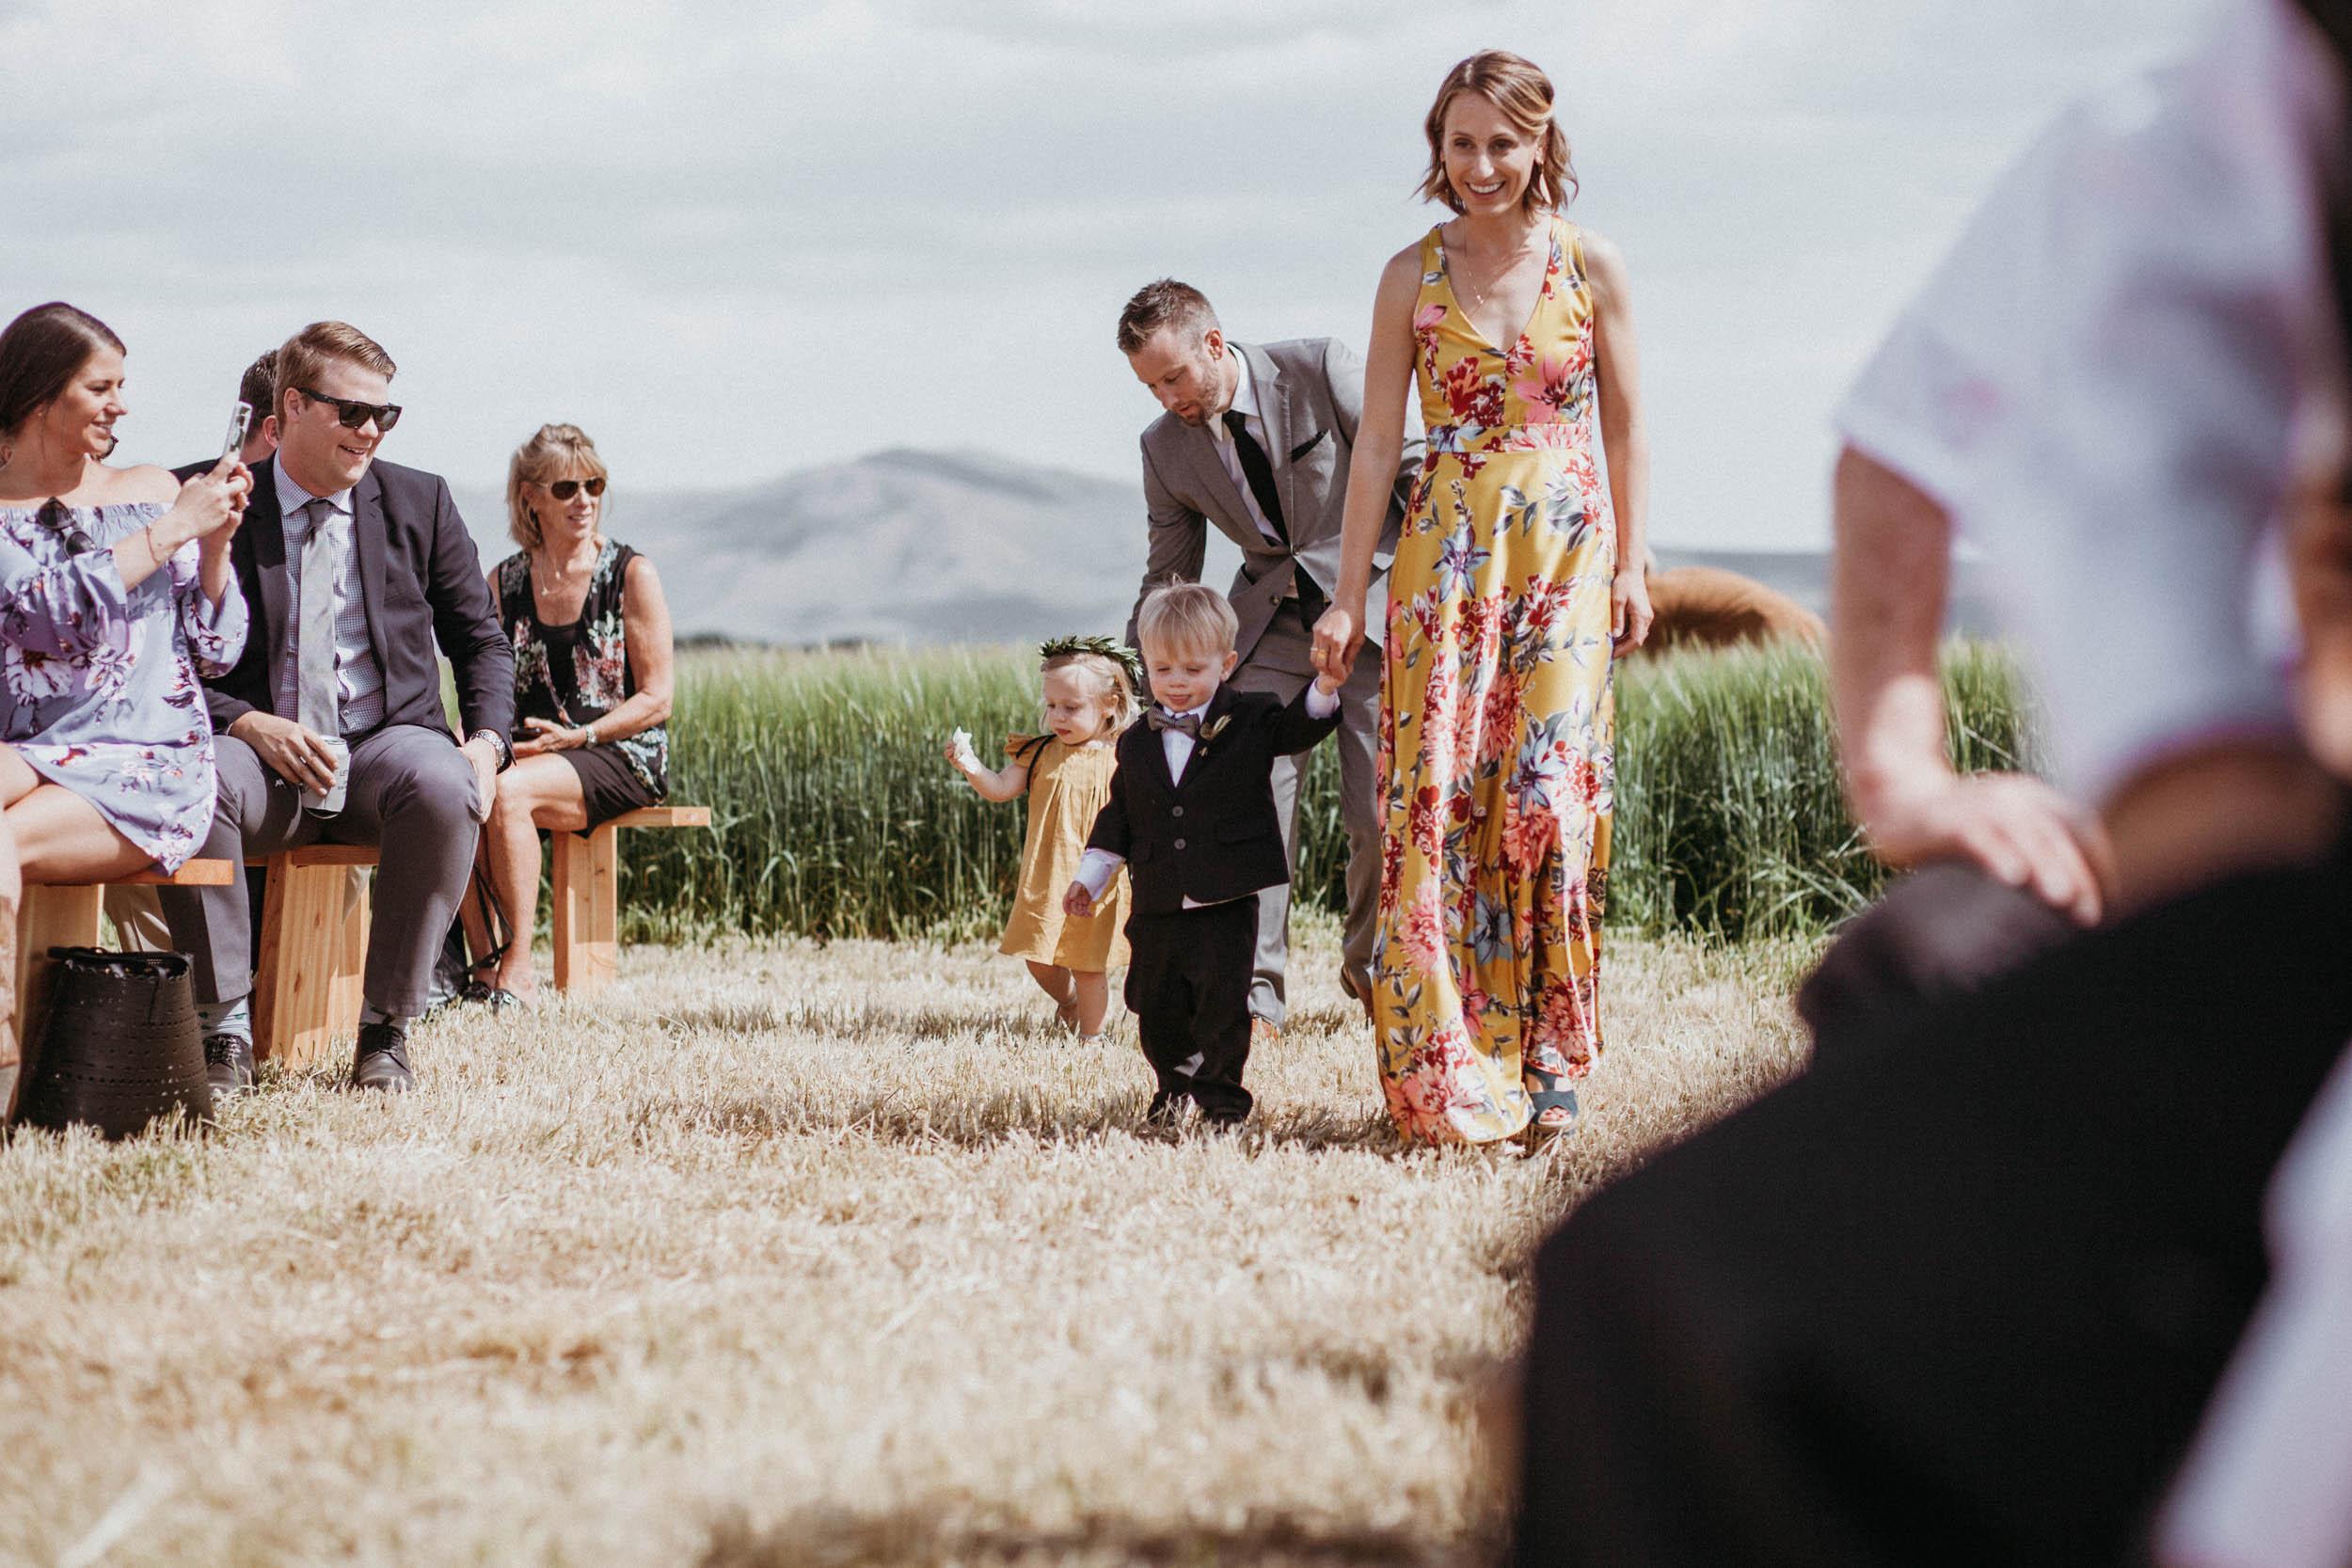 d_M_Sun_valley_wedding-95.jpg